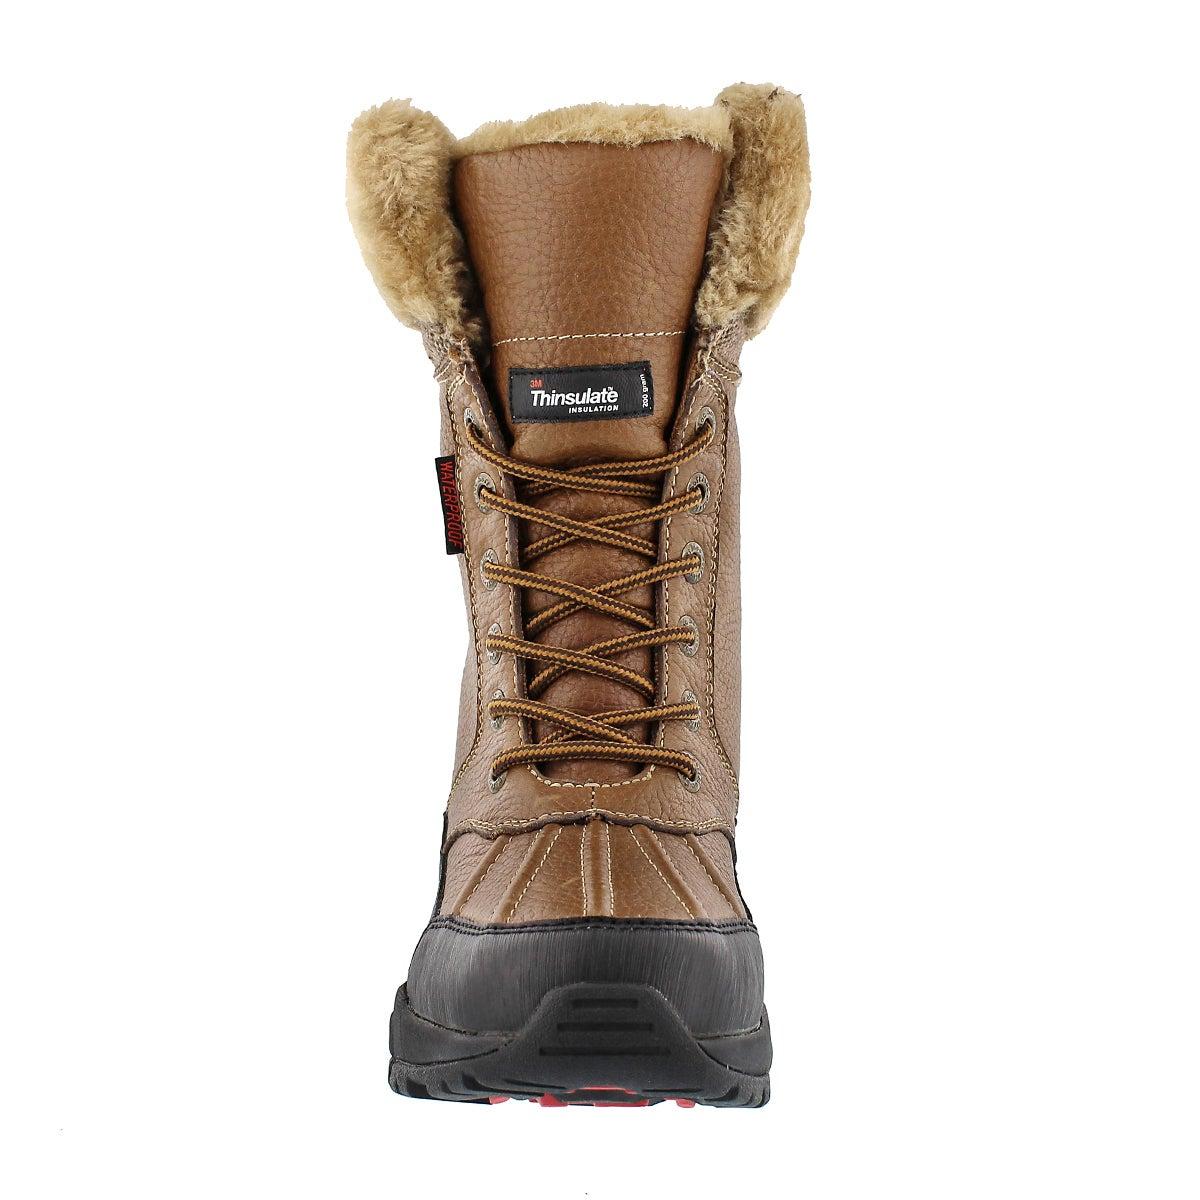 Lds Megan tan lace-up wtpf winter boot